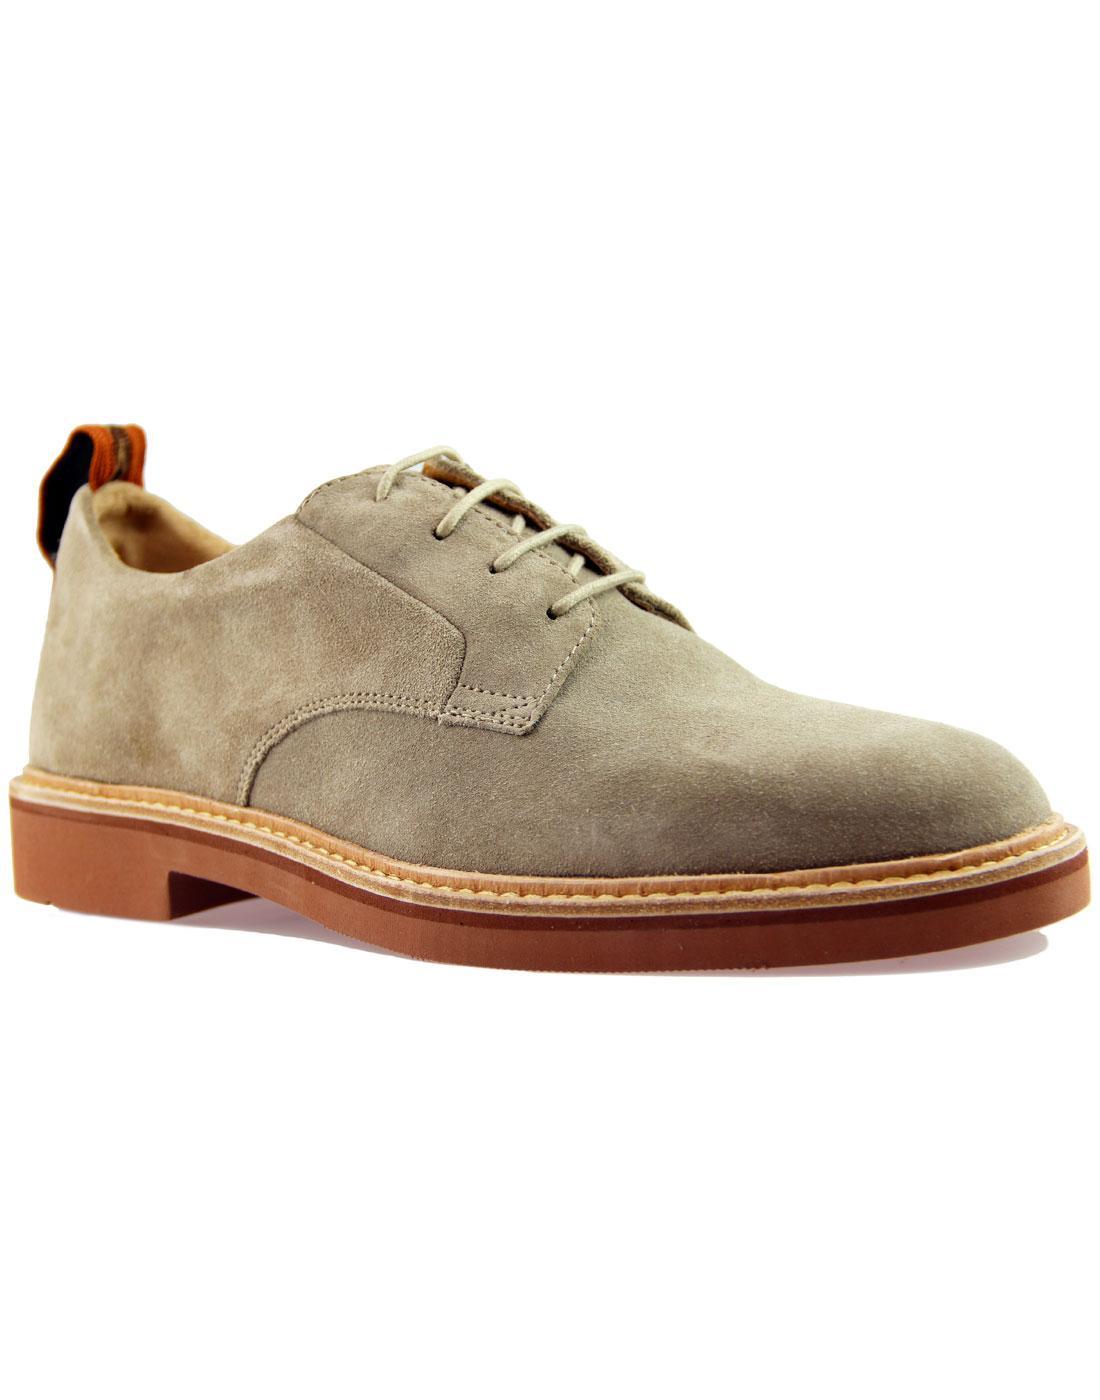 Malto HUDSON 365 Collection Mod Suede Shoes Stone